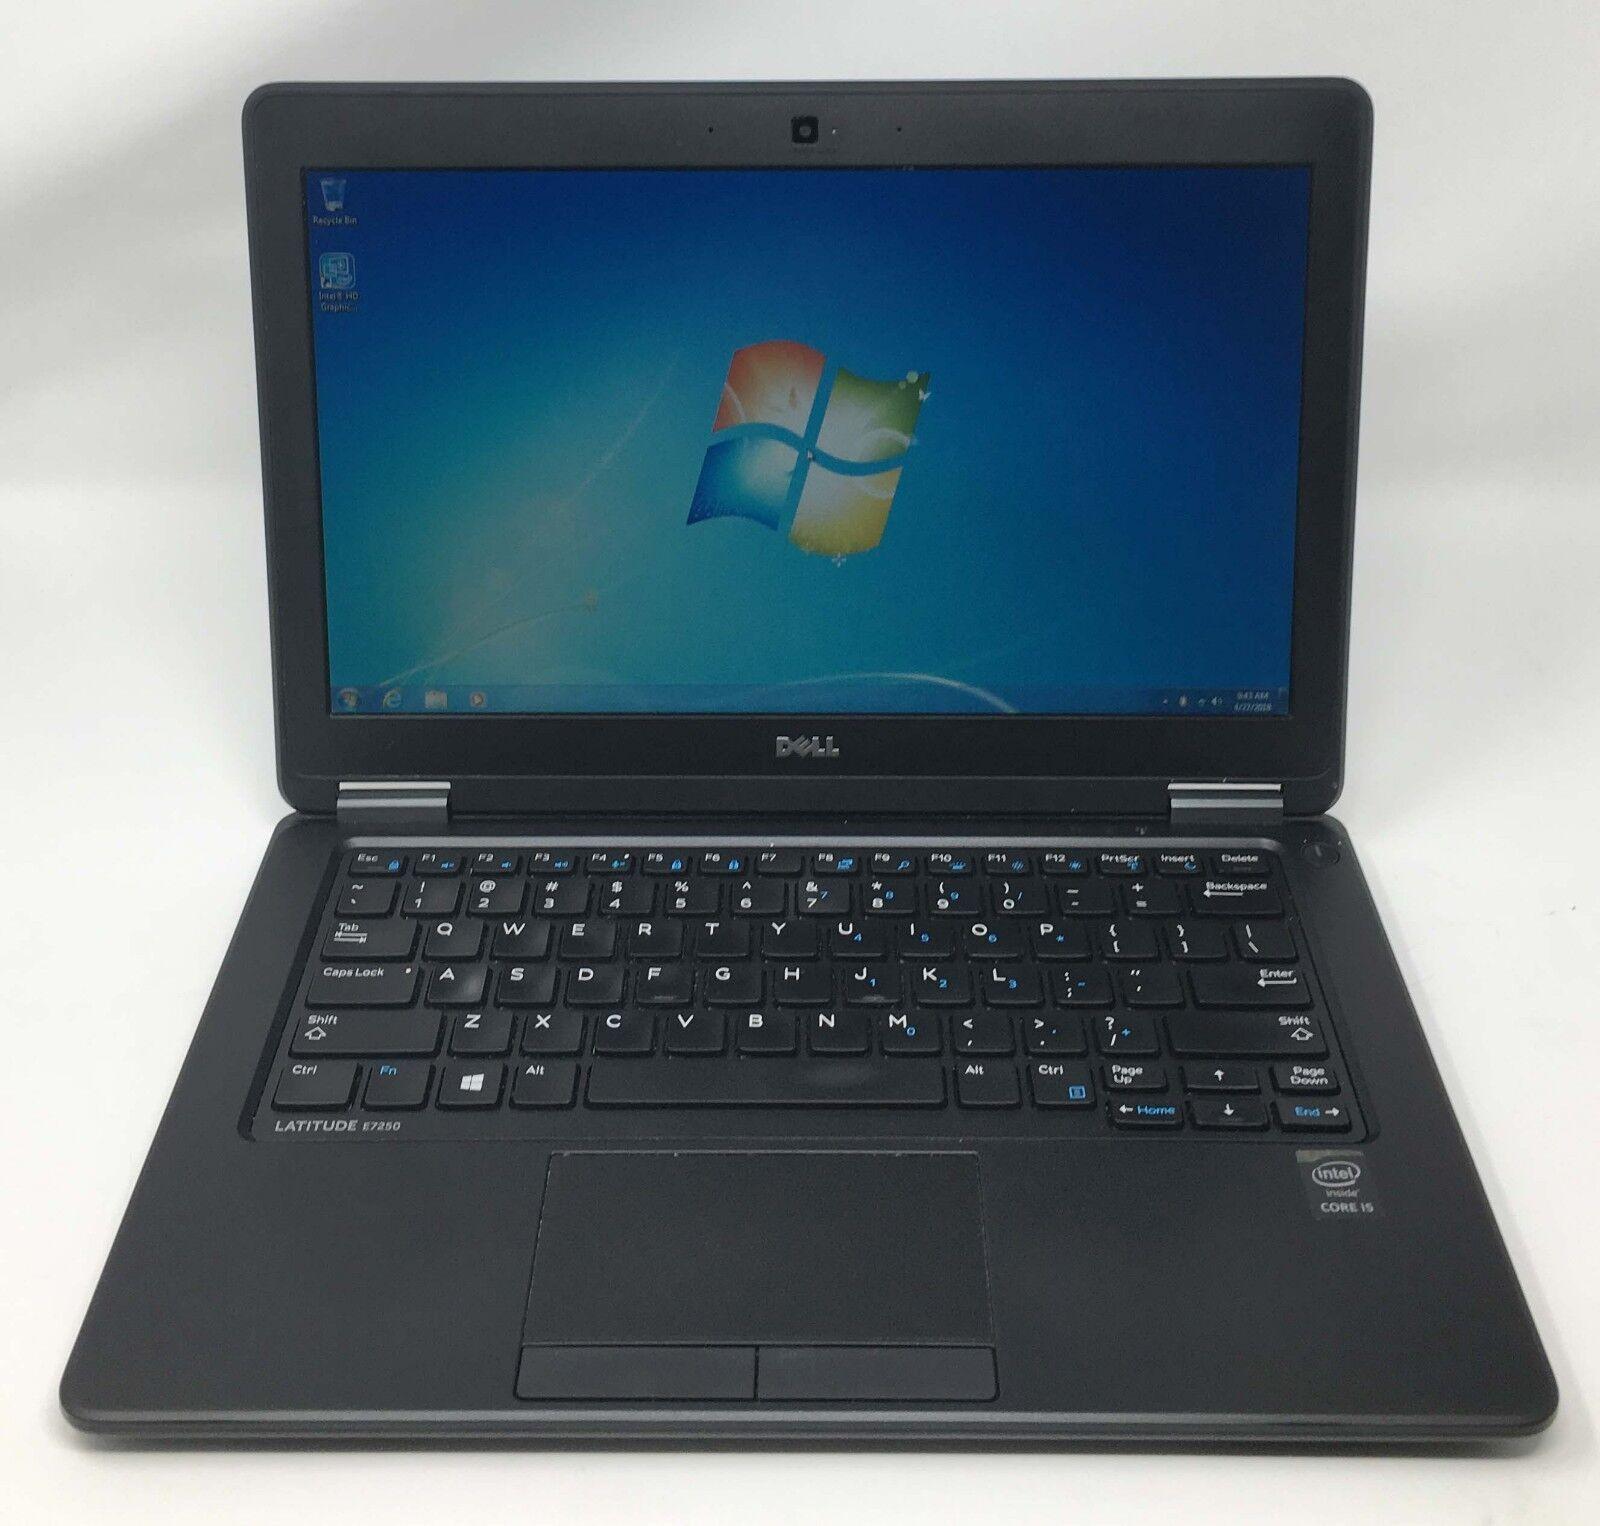 Dell Ultrabook E7250 Core i5-5300u 2.3GHz 16GB 128GB SSD Webcam Win 7 Laptop